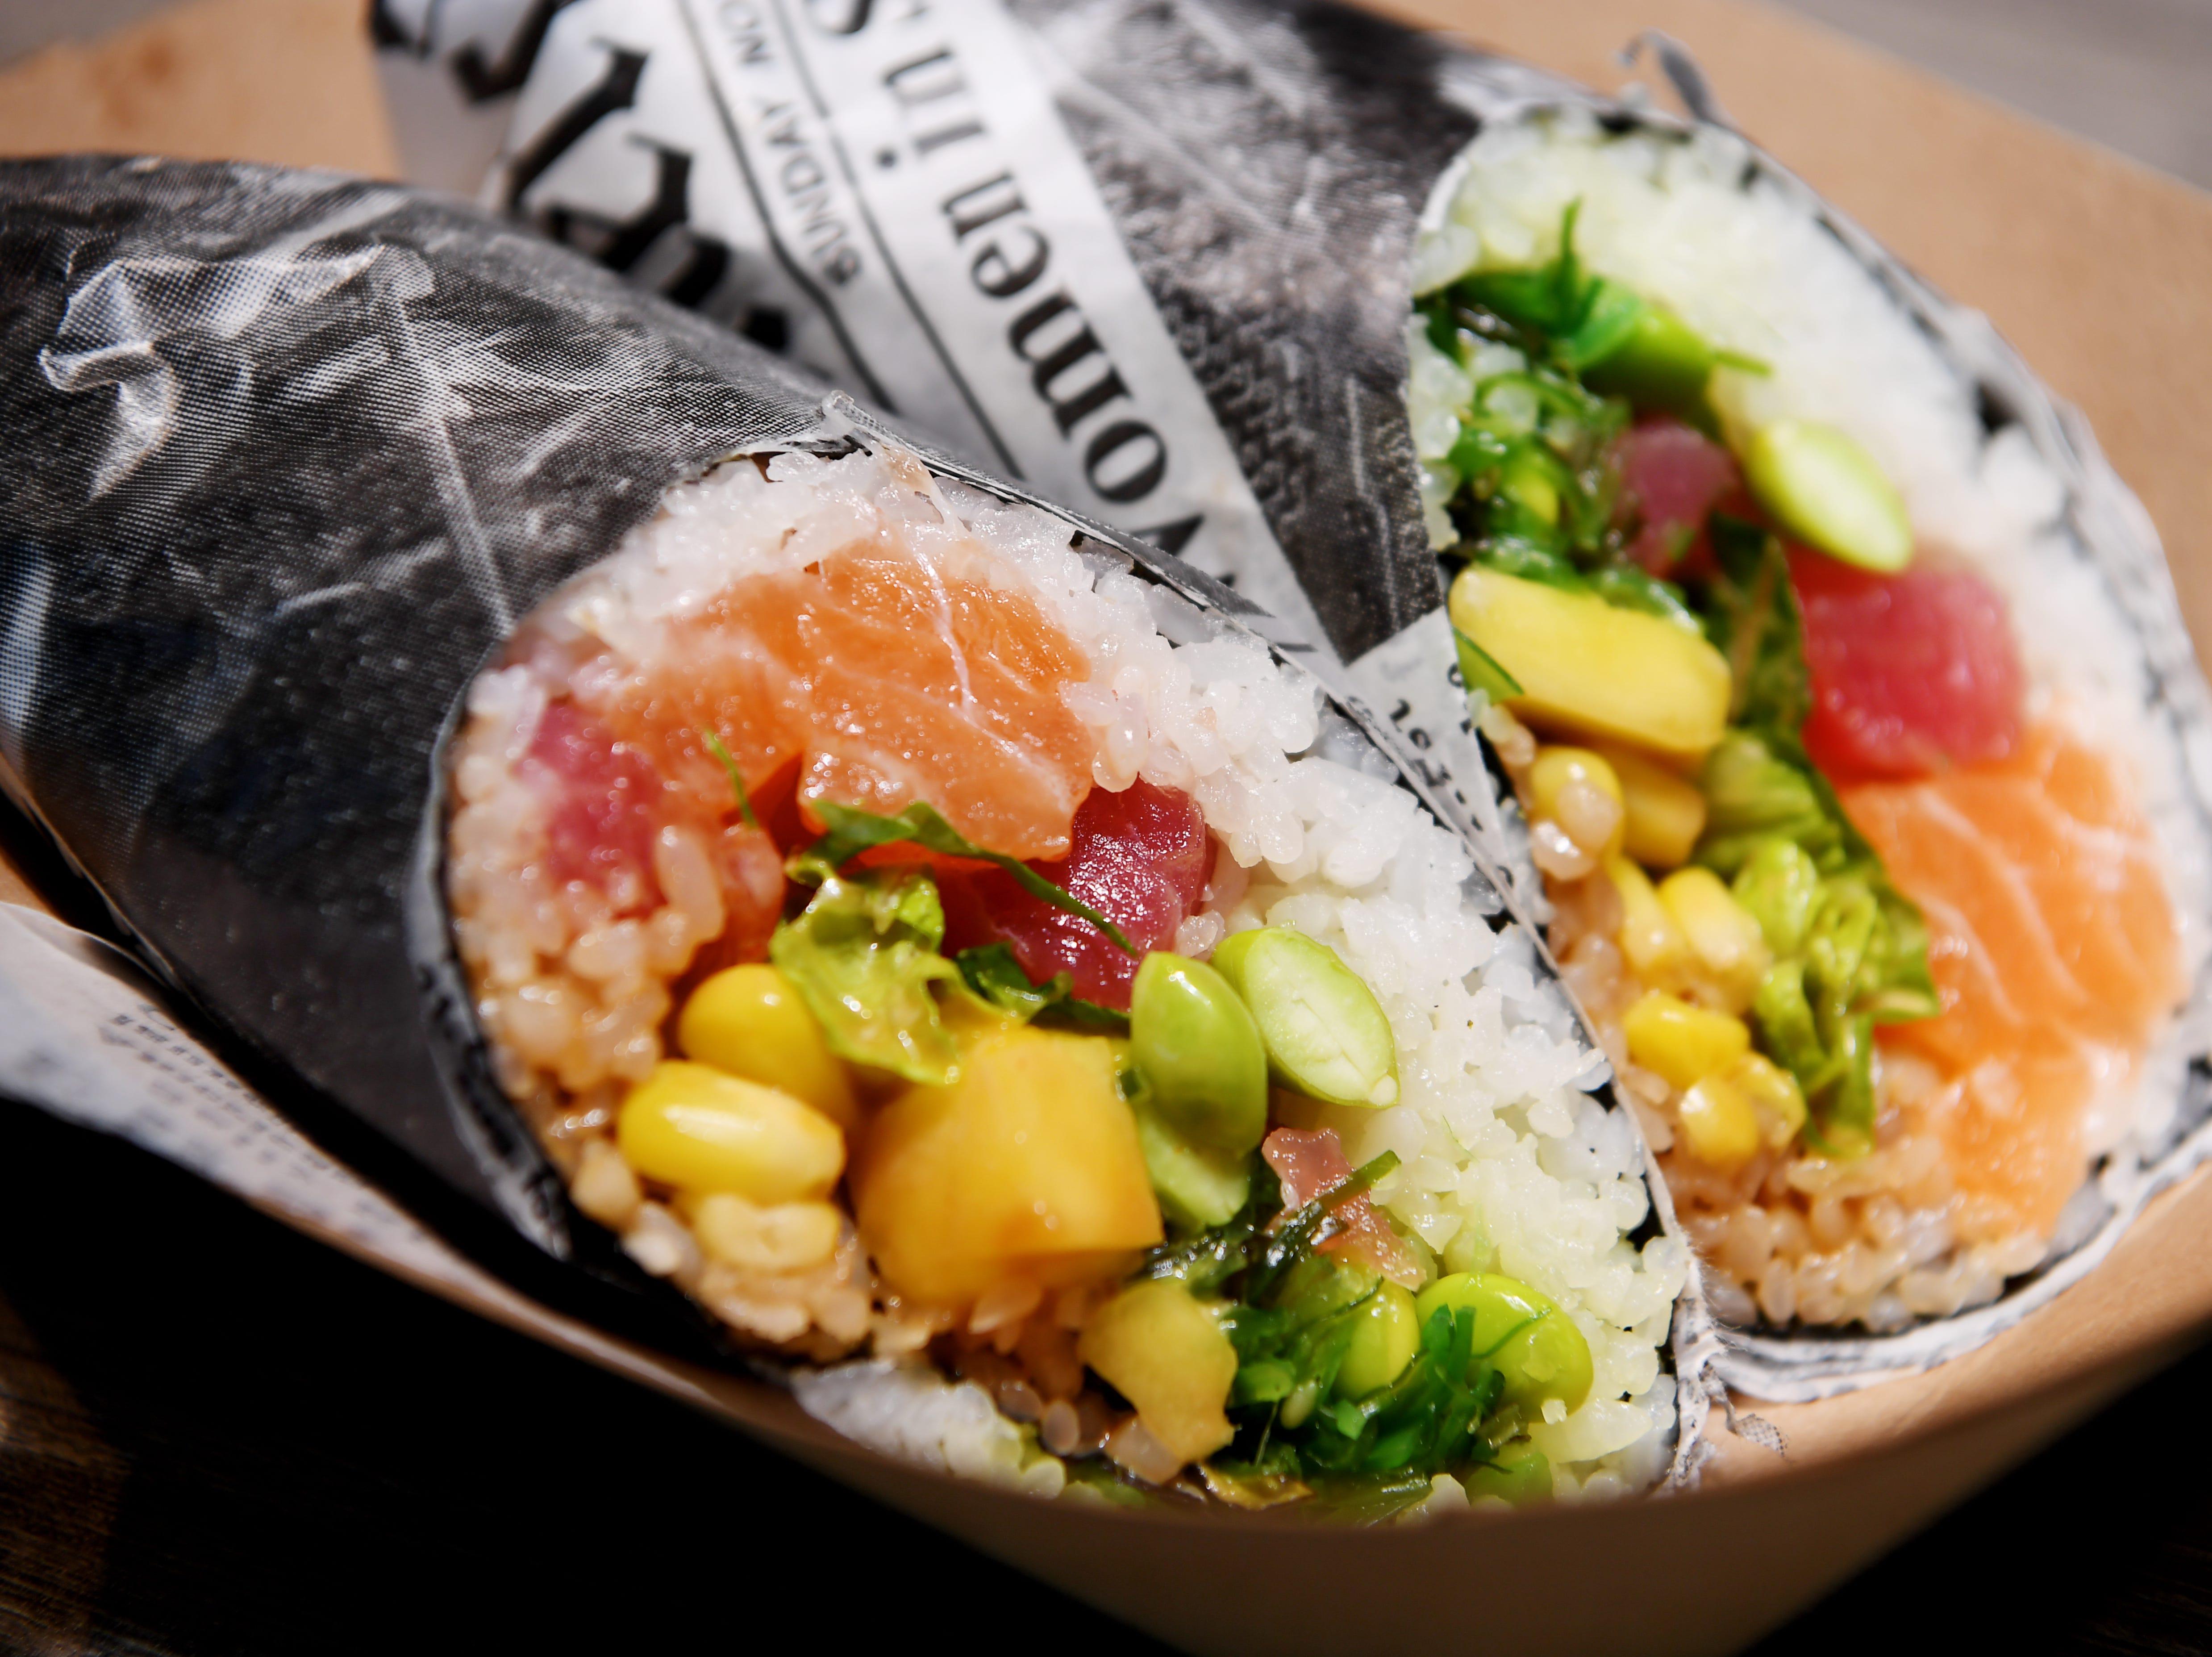 The signature Yum's Classic at Yum Sushi and Poke's in Arden comes with diced Ahi tuna, salmon, seaweed salad, mango, edamame, sweet corn, sriracha aioli and unagi sauce.